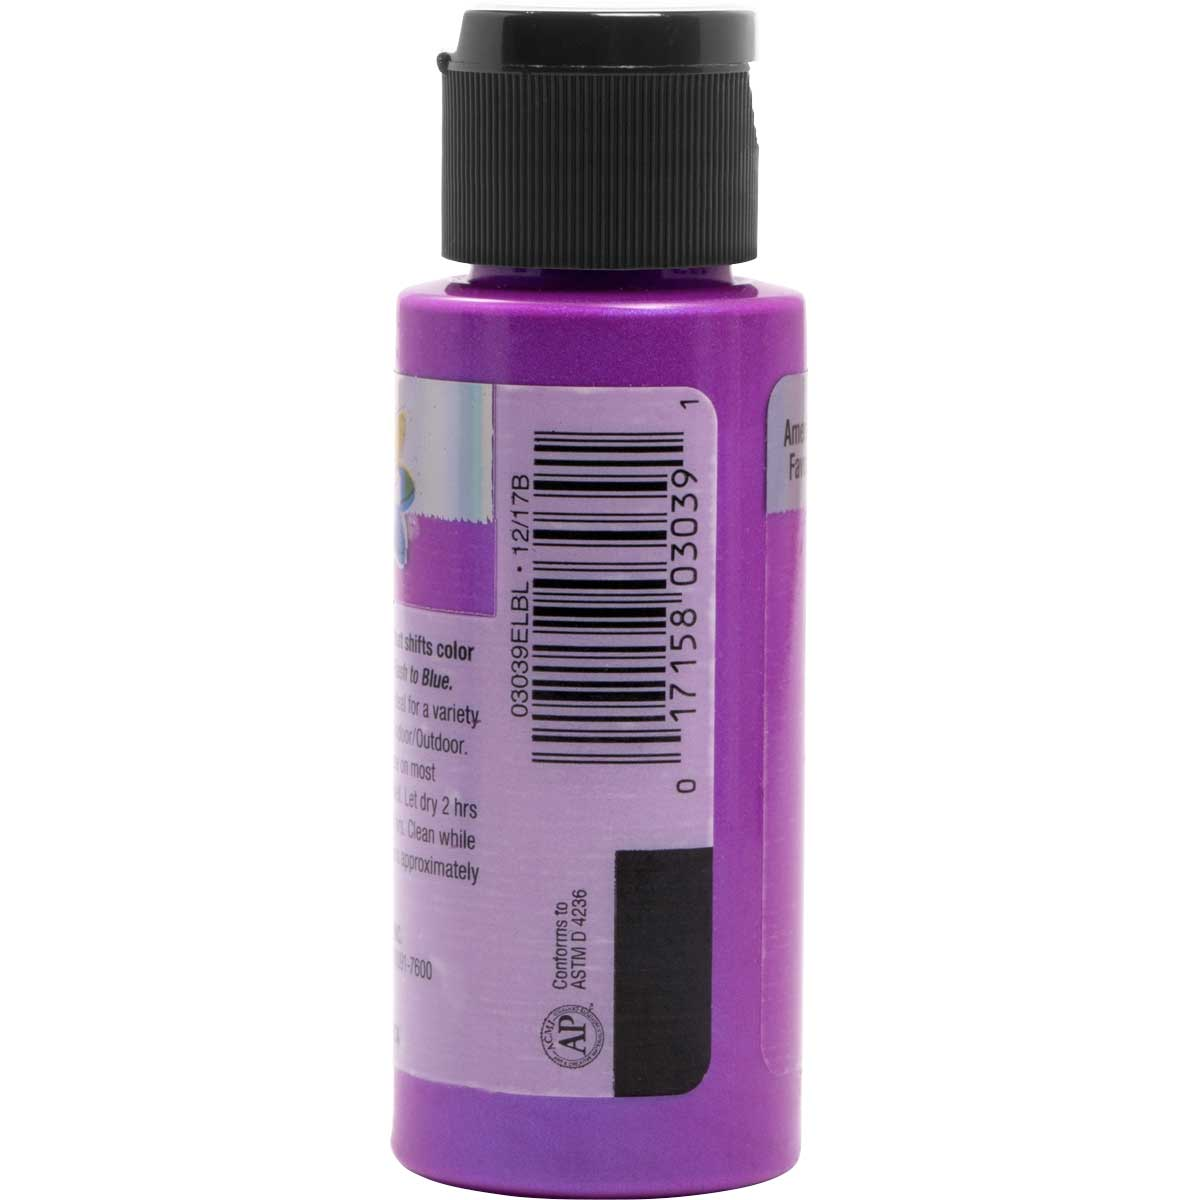 Delta Ceramcoat ® Acrylic Paint - Flash Metallic Purple, 2 oz.